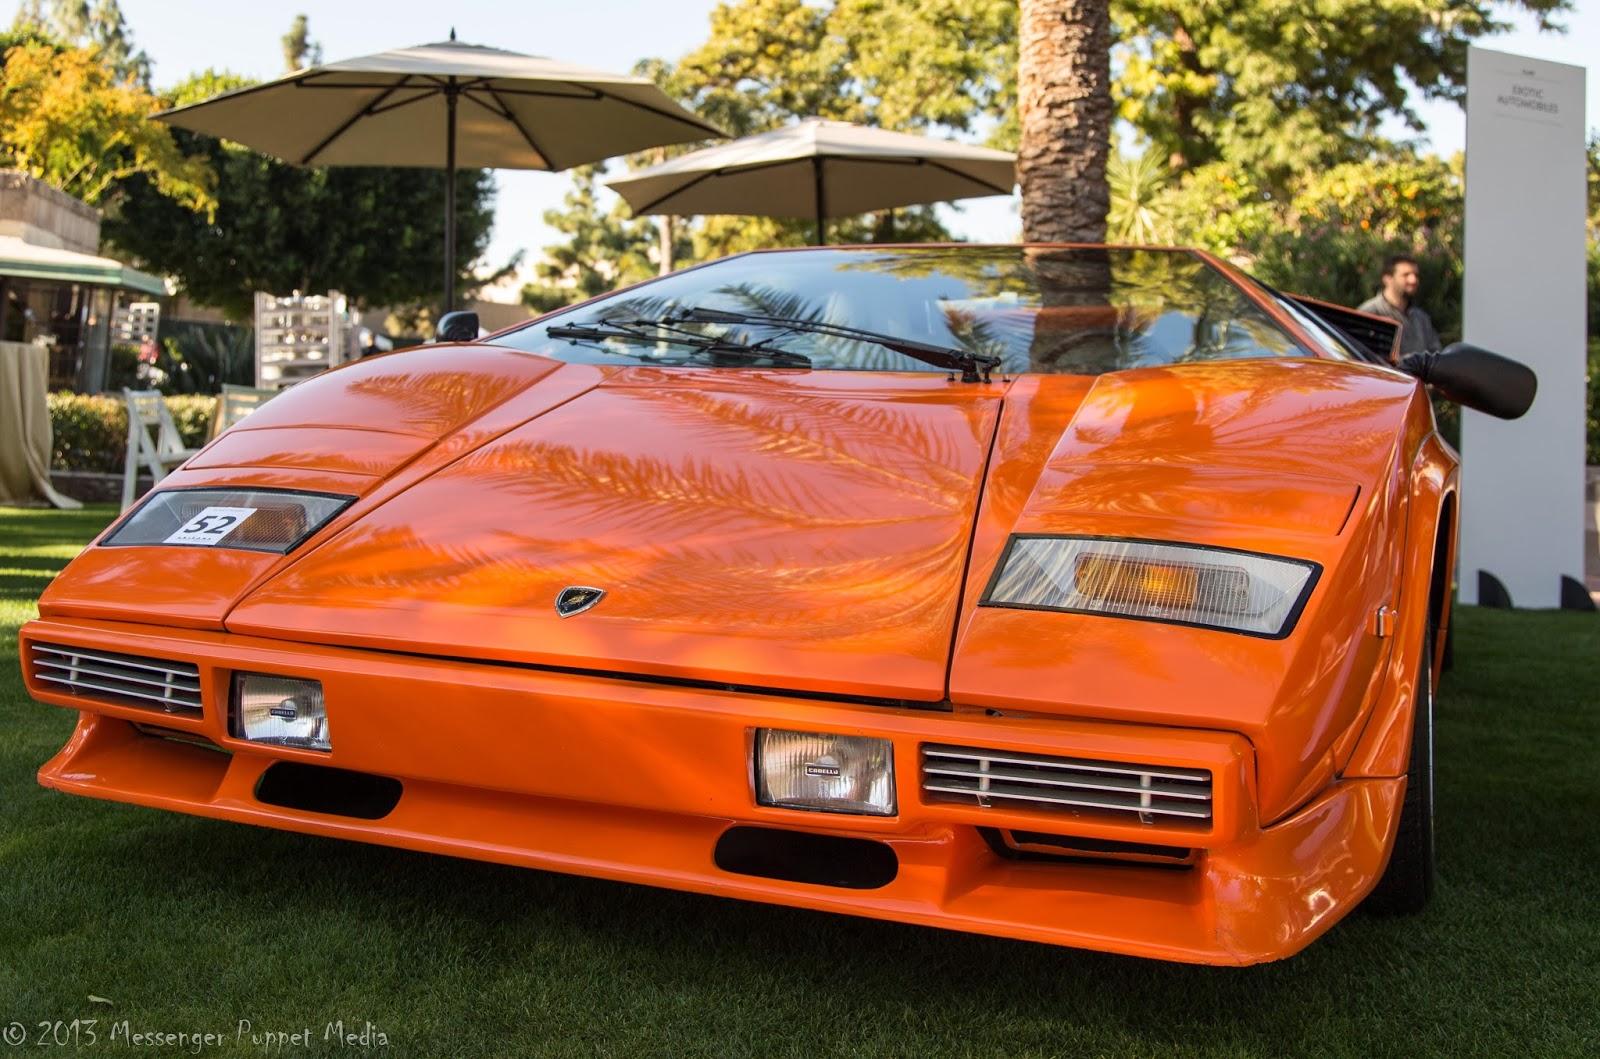 1975 Lamborghini LP400 Countach